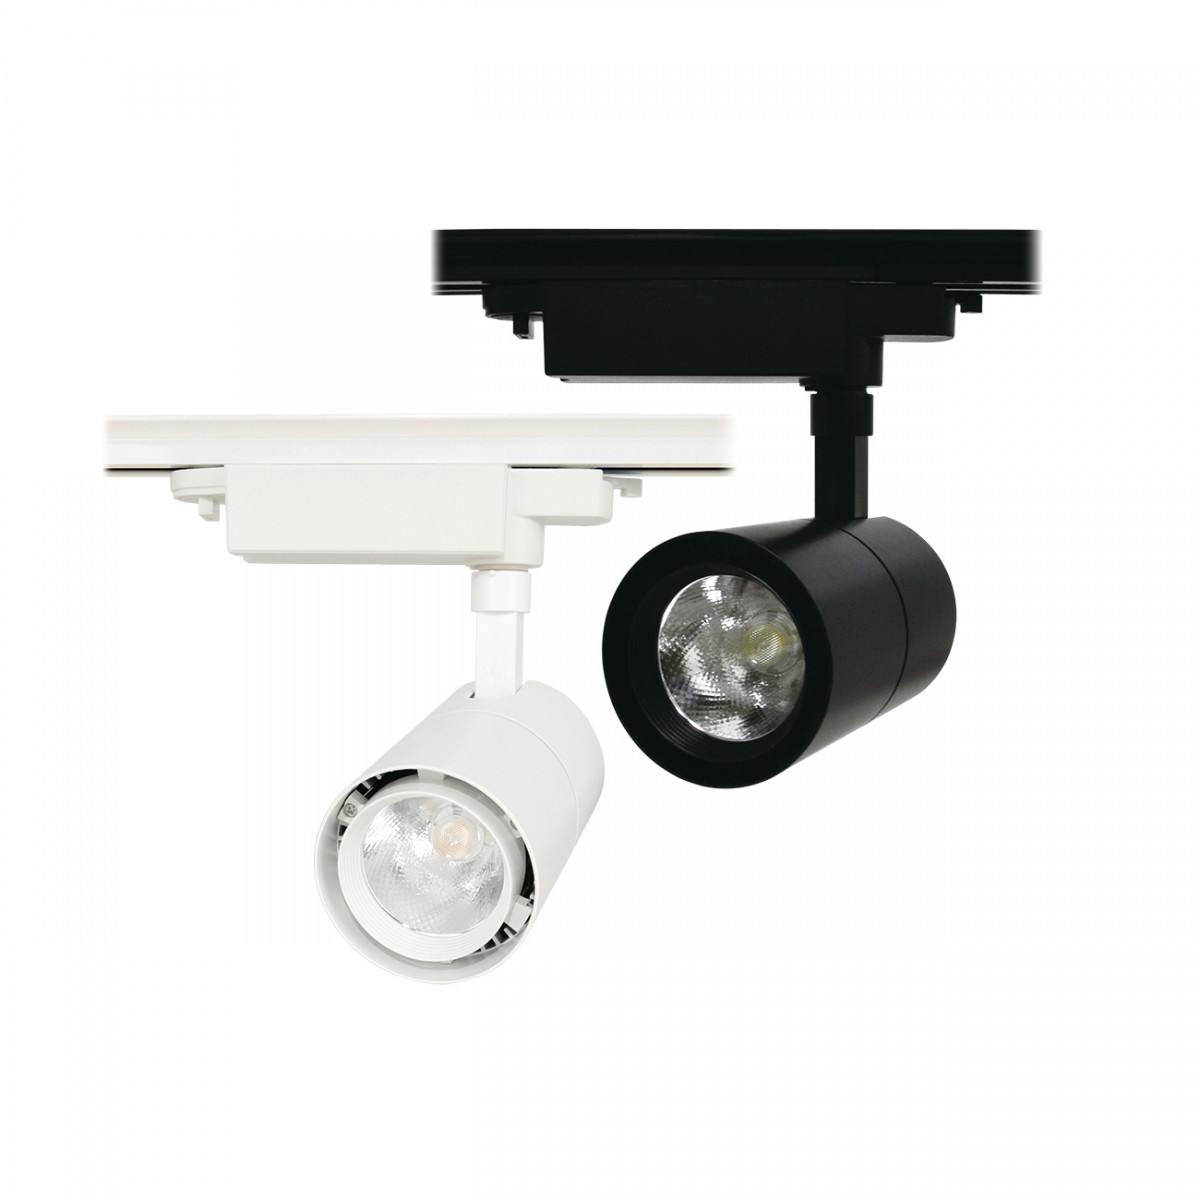 Spot LED 15W Para Trilho Eletrificado Preto ou Branco Bivolt